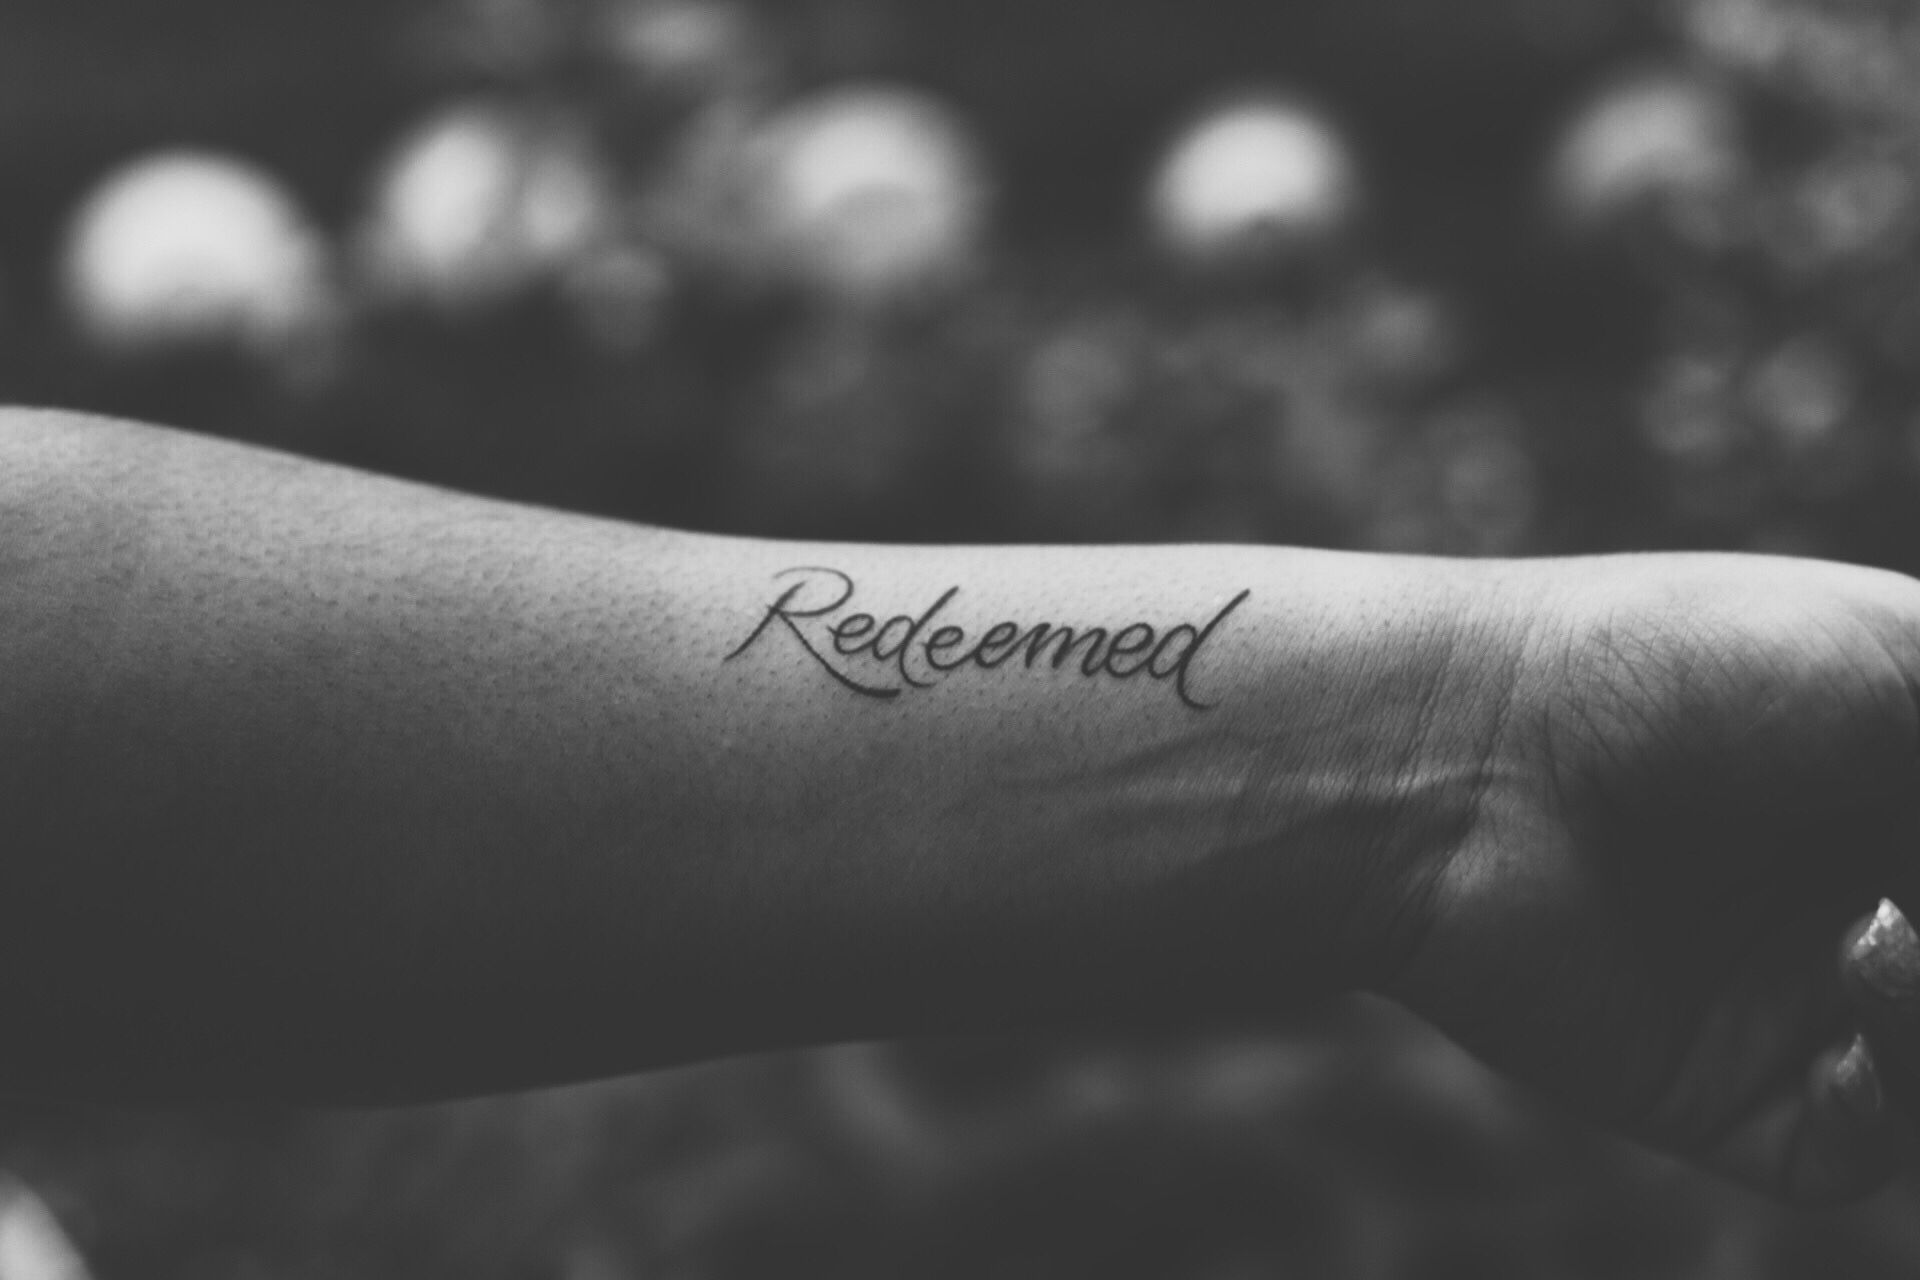 Redeemed.  pic-cred: Caroline BW tattoo artist: Jake @ call of the wild